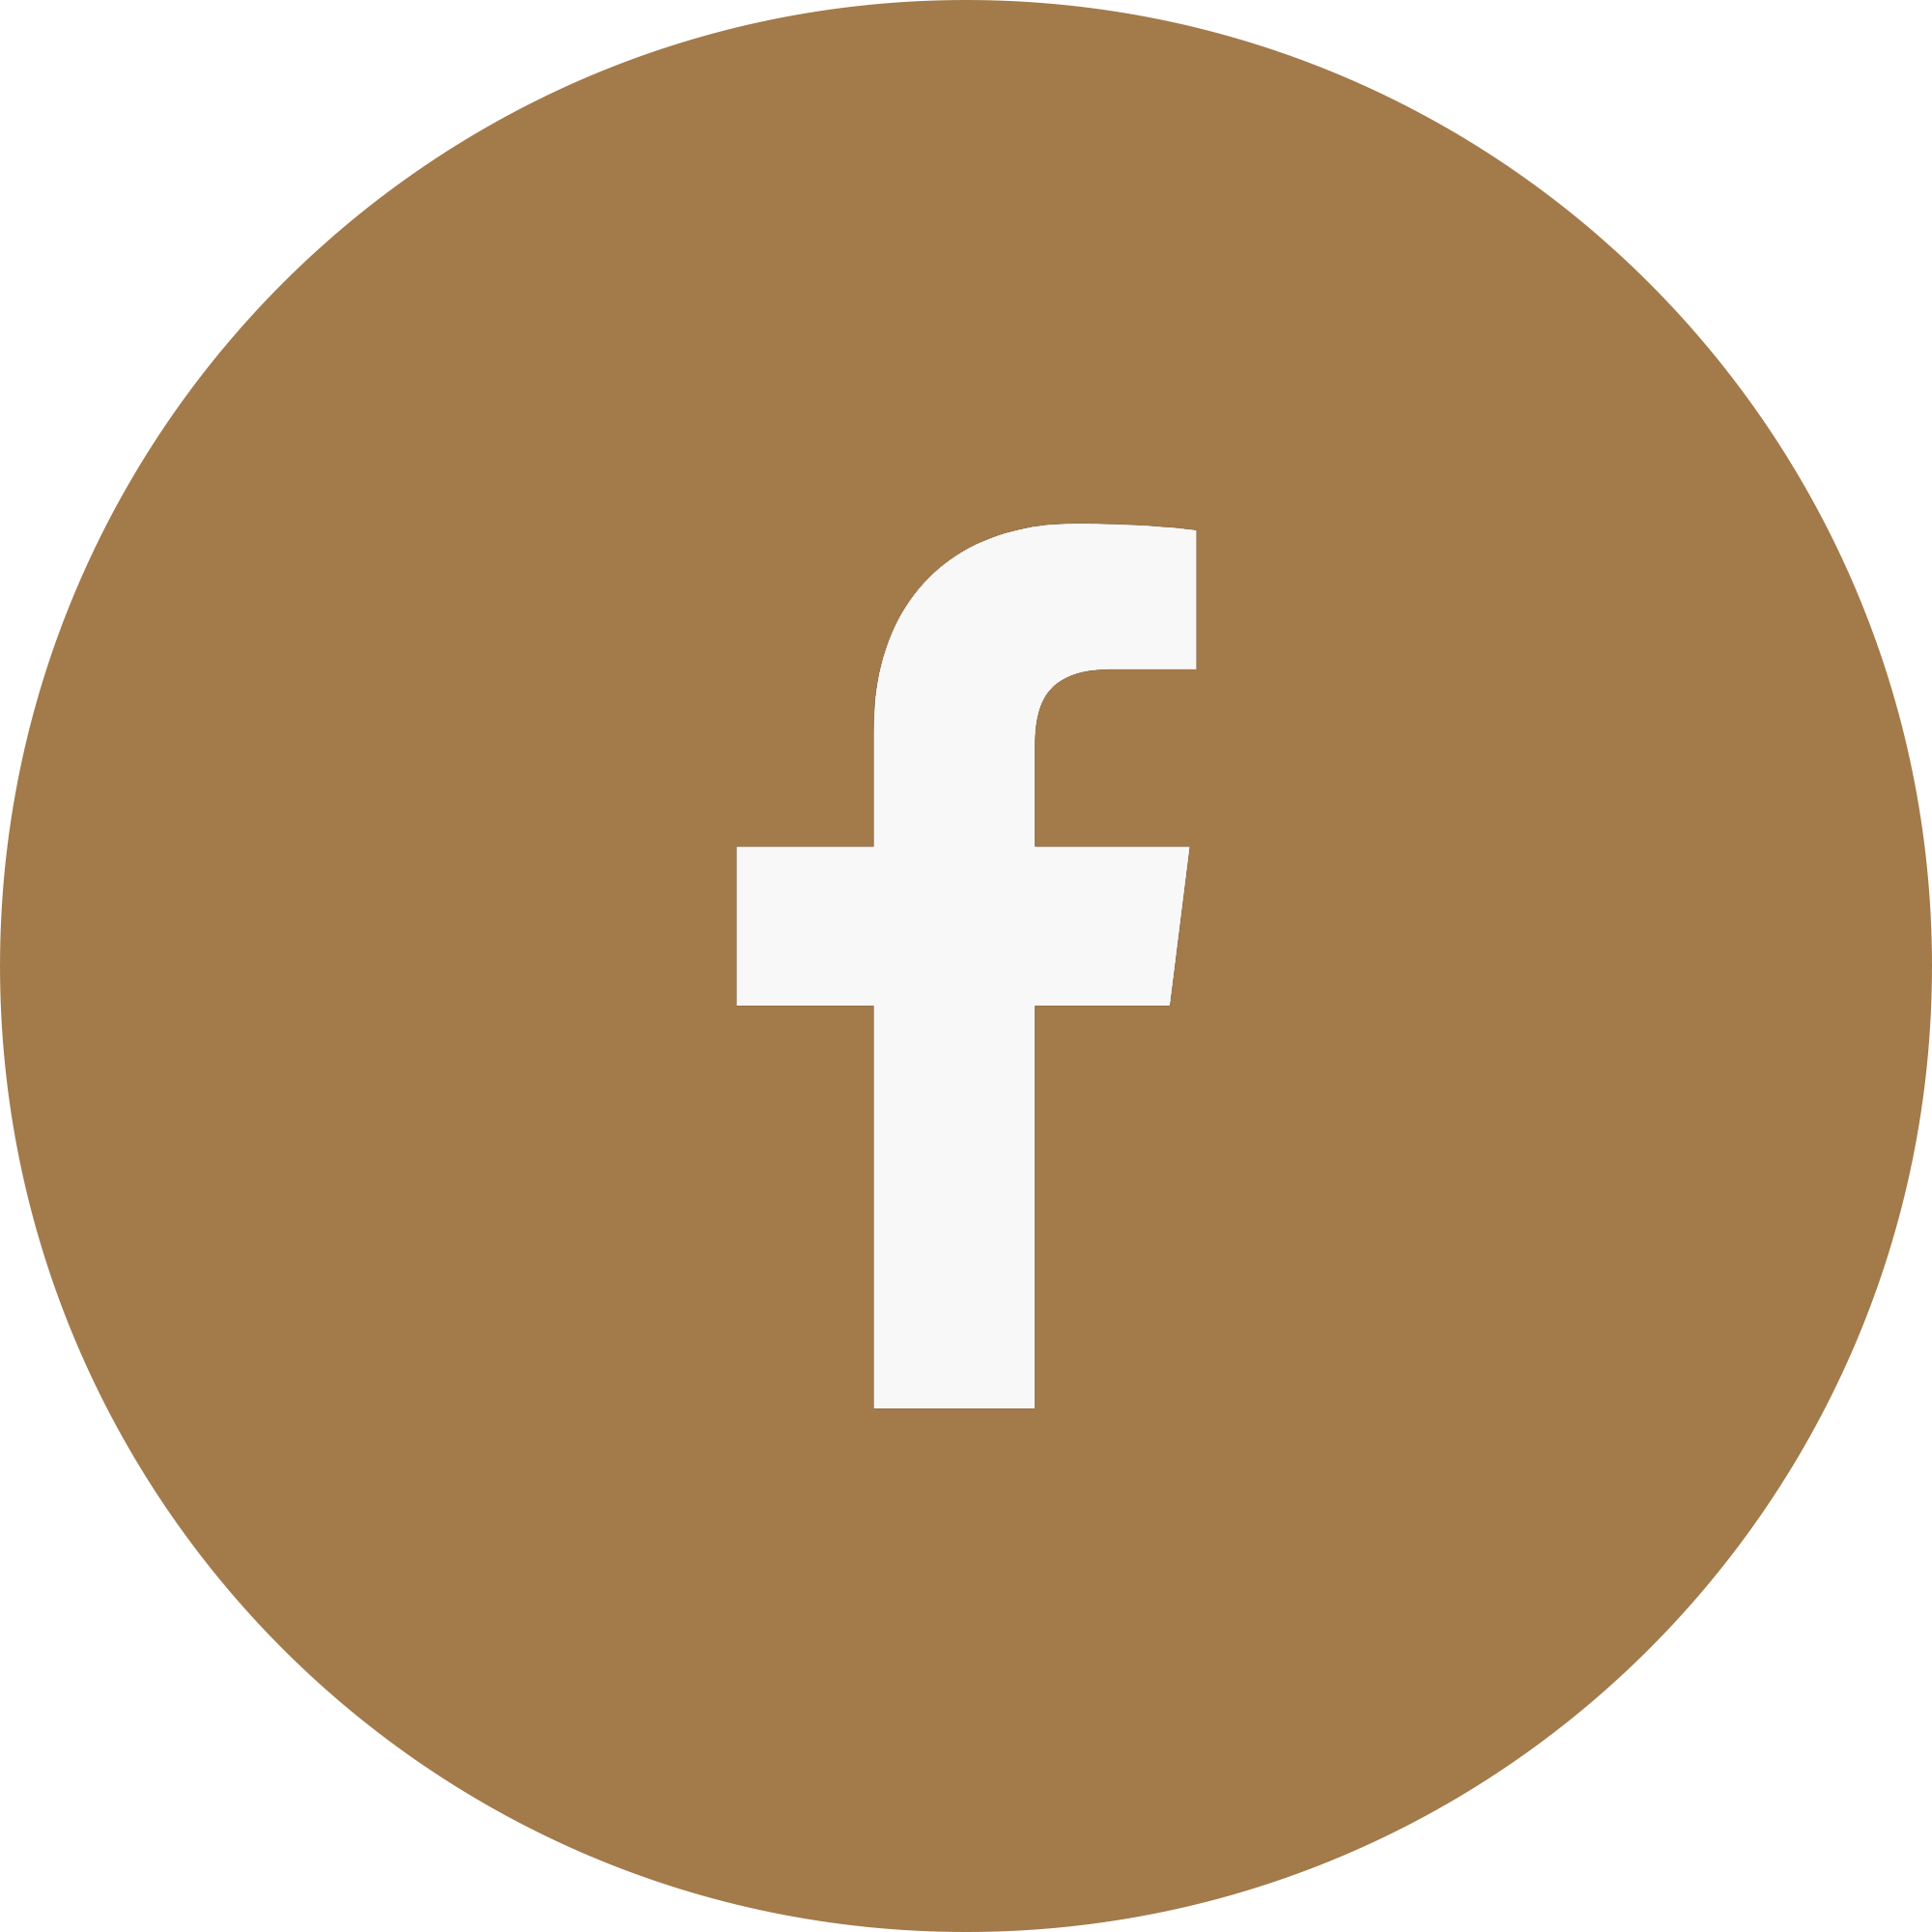 https://www.facebook.com/brainside.org